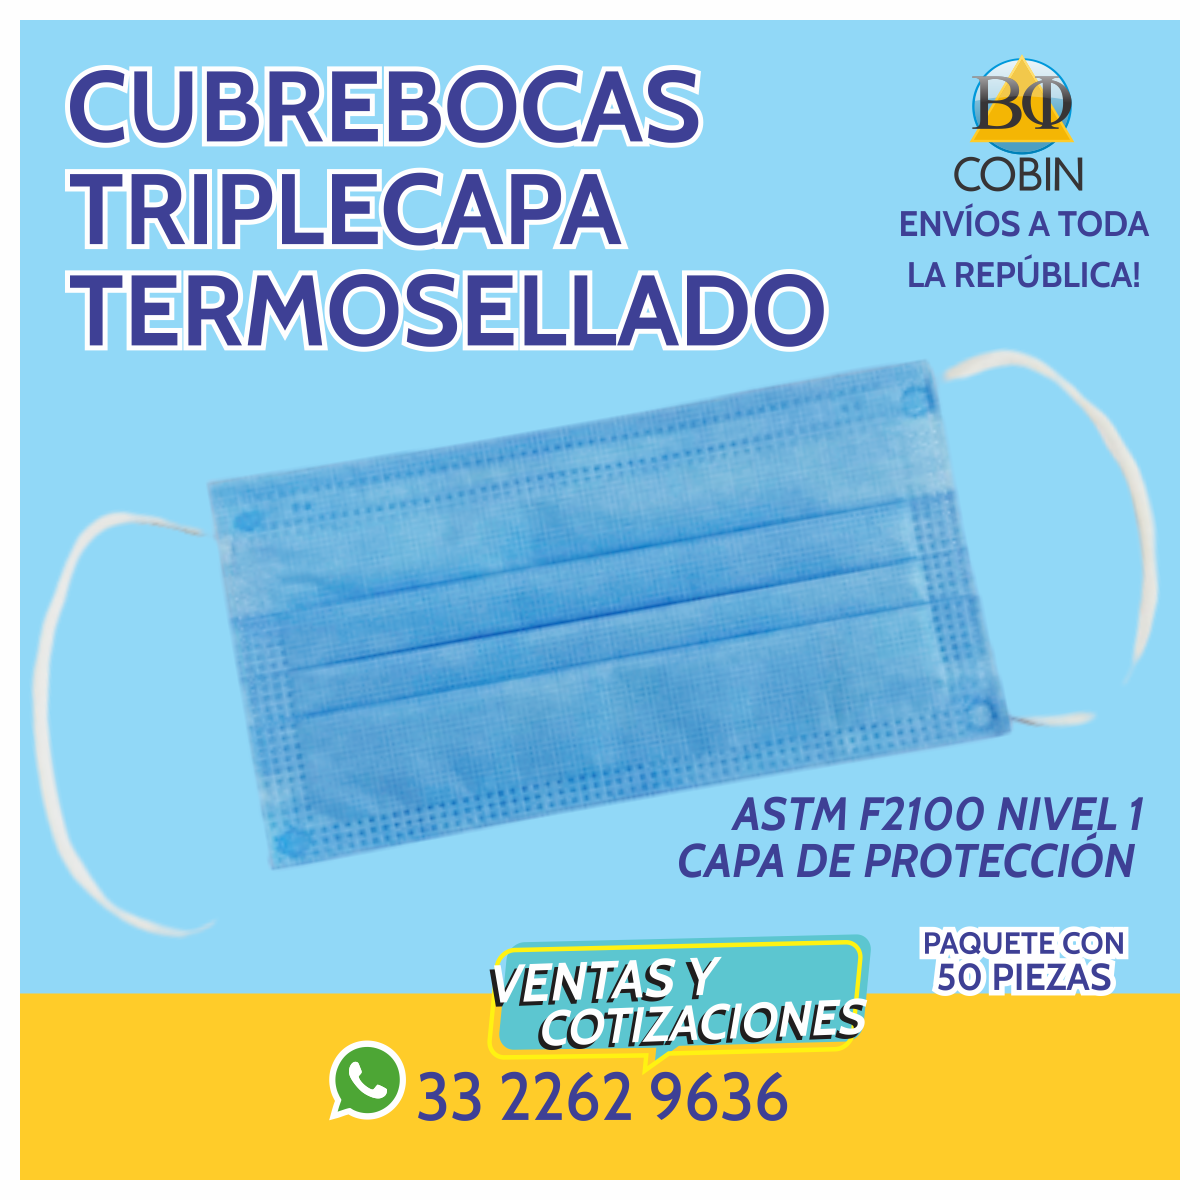 Cubrebocas Triplecapa Termosellado